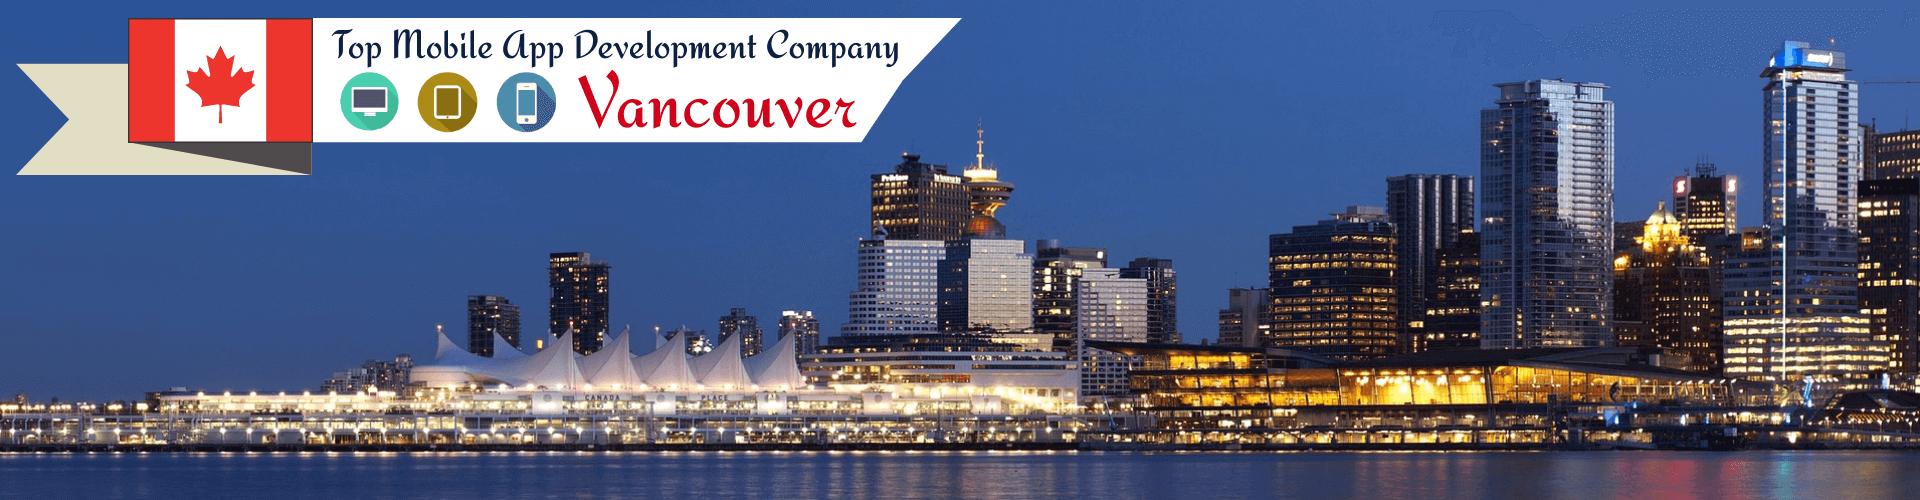 top mobile app development company vancouver